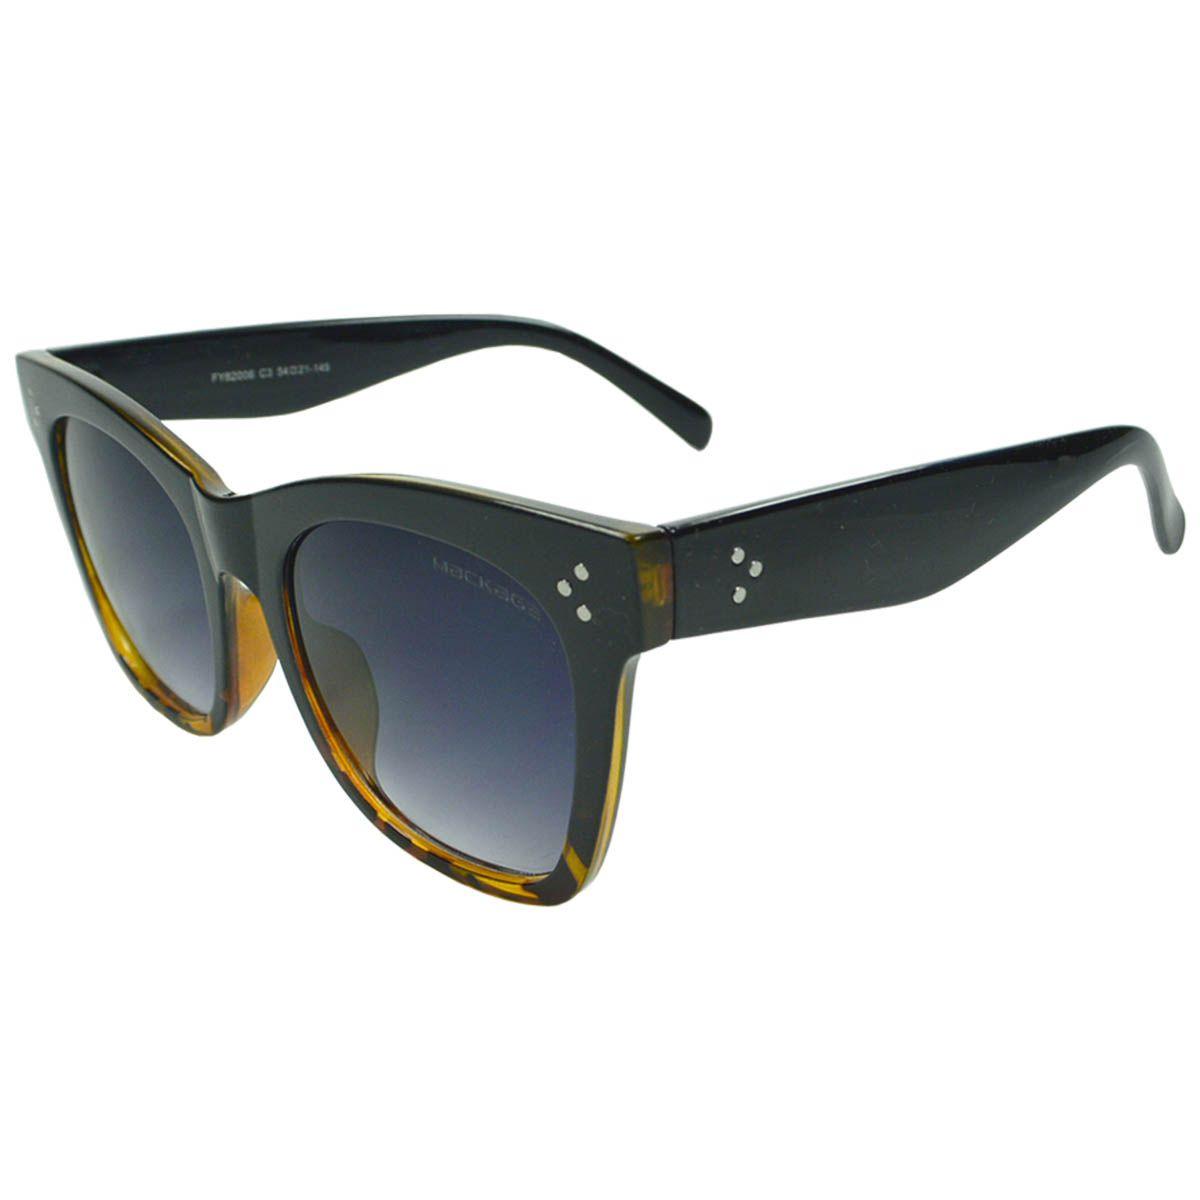 09f5d2508e Óculos de Sol Feminino Mackage MK82006 - Mackage ...